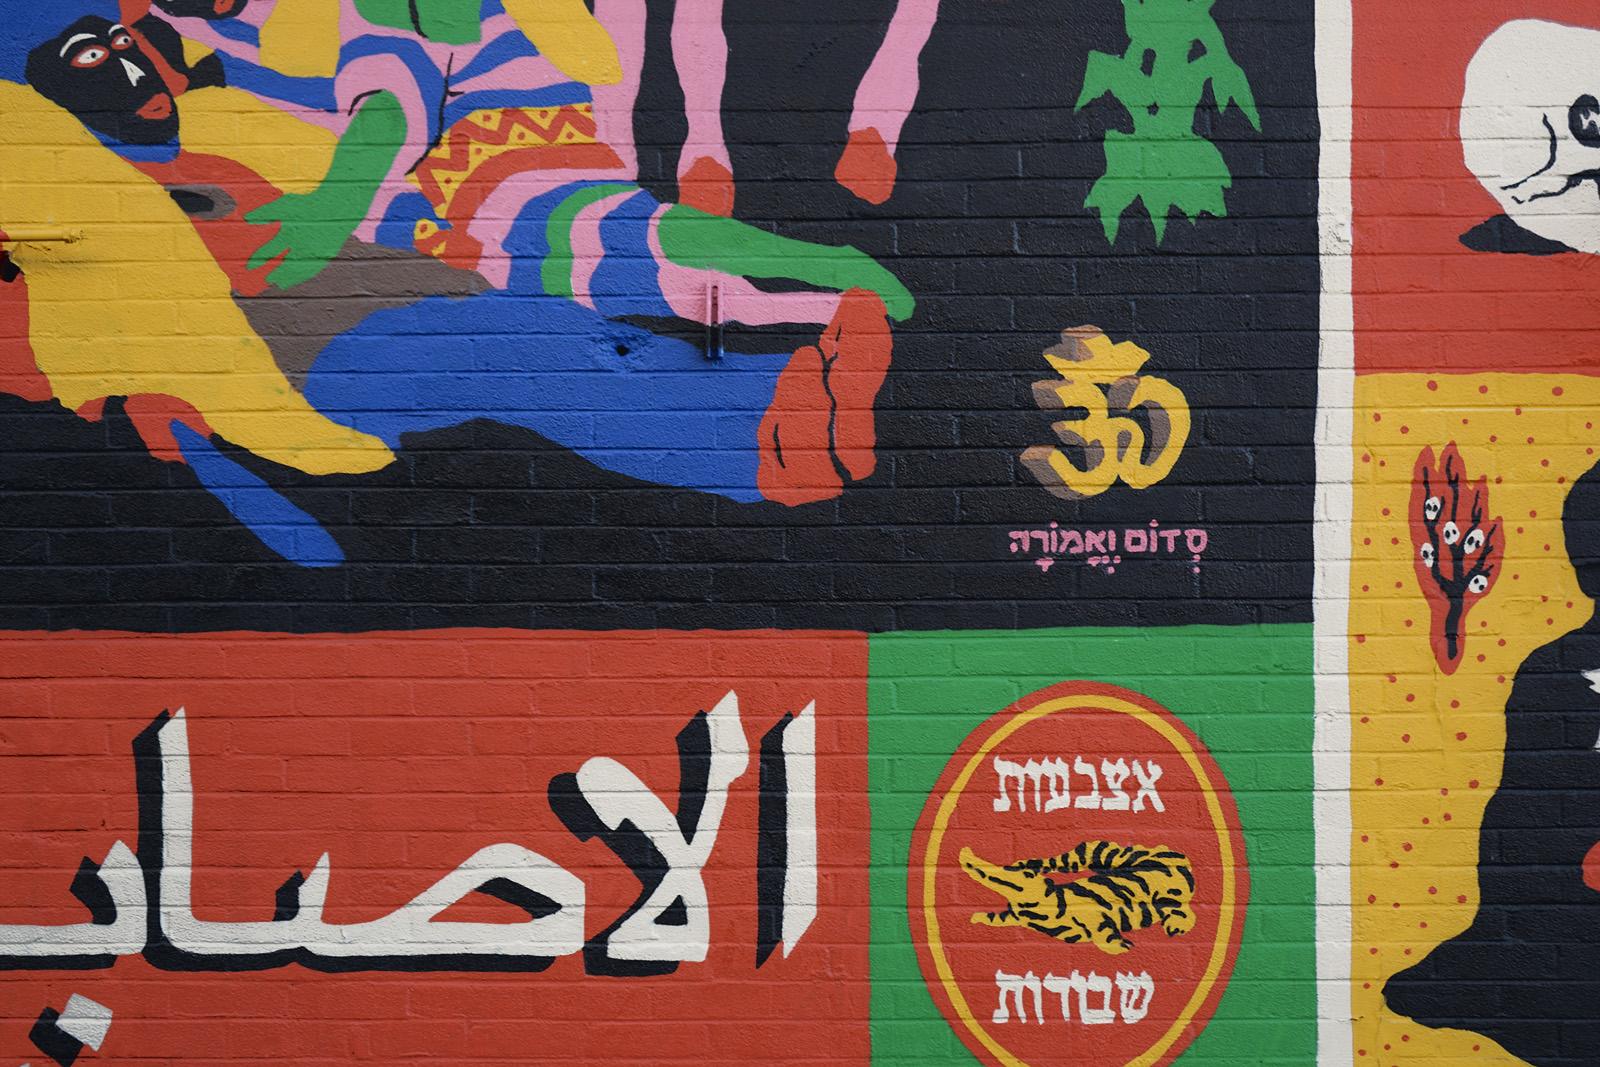 broken fingaz crew bfc haifa israel street art graffiti hebrew arabic las vegas usa life is beautiful deso tant kip unga